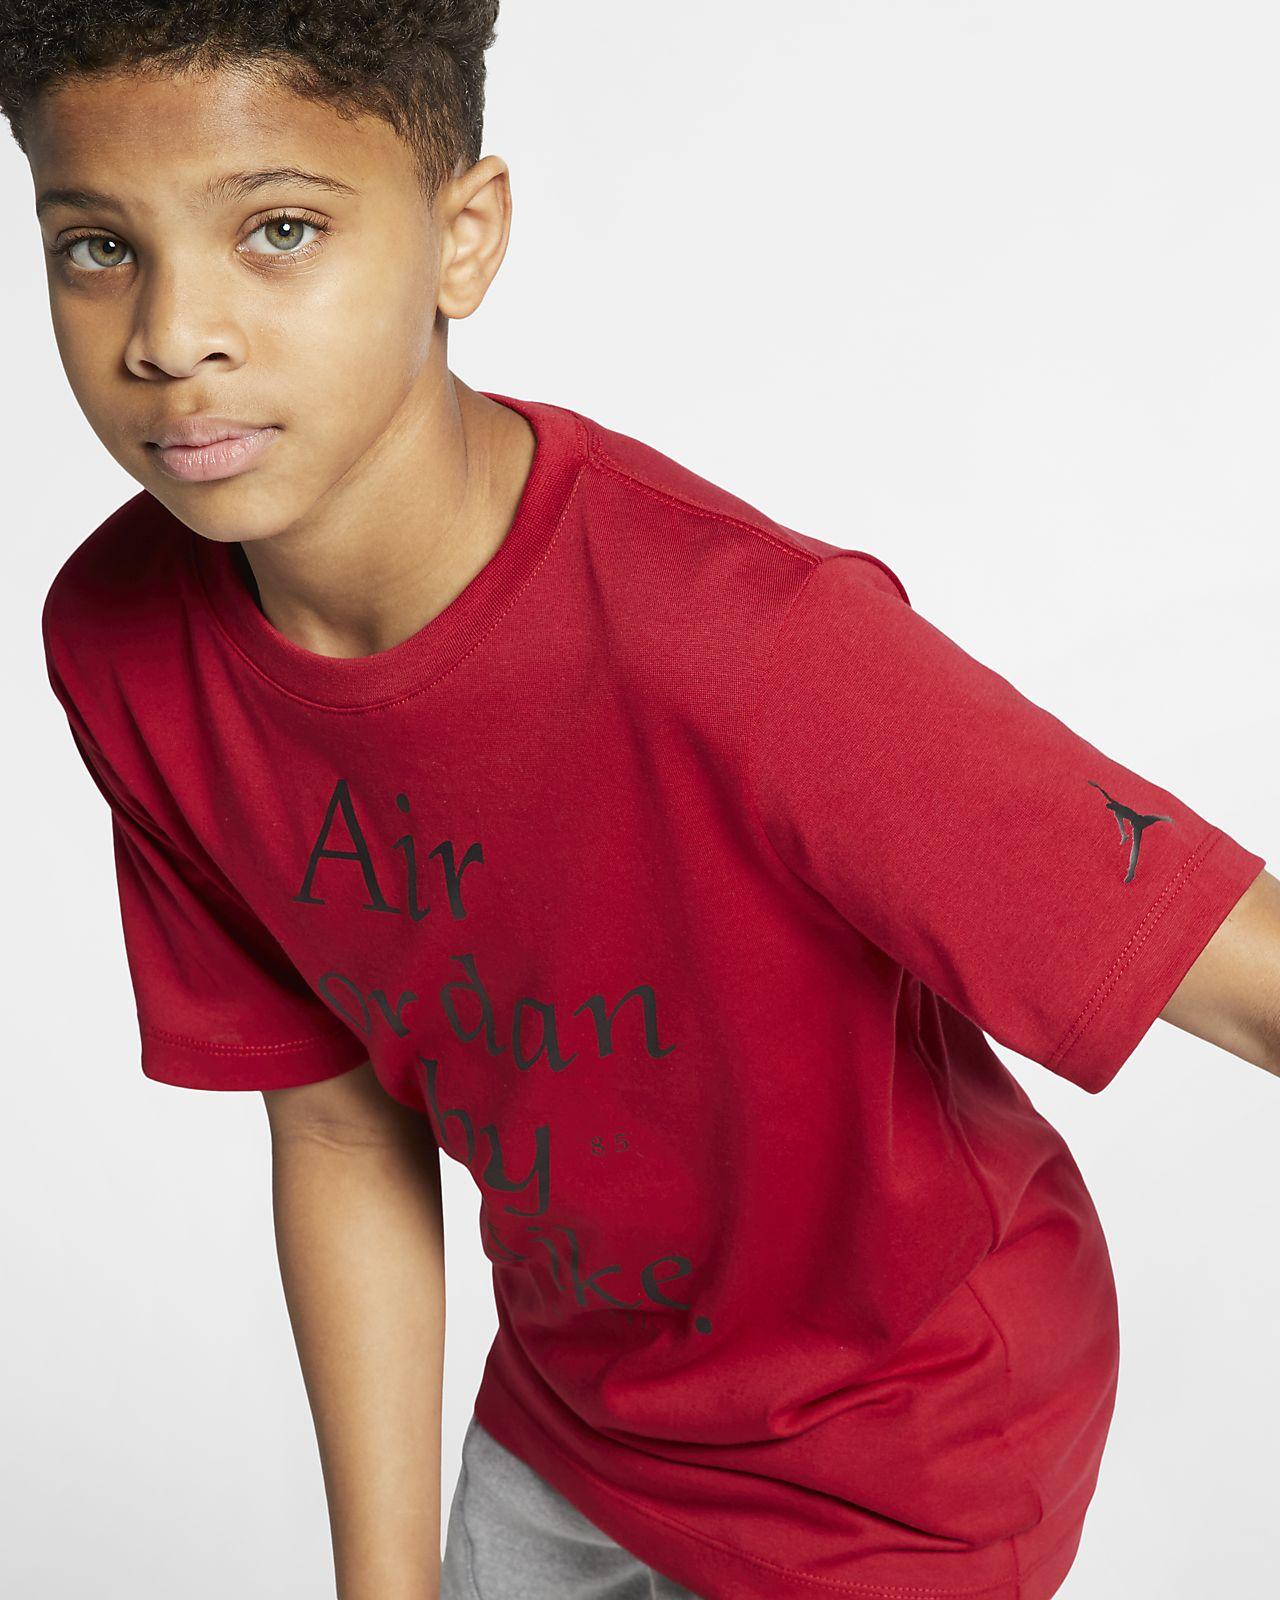 bf7197727cee Jordan Lifestyle Older Kids  (Boys ) T-Shirt. Nike.com LU